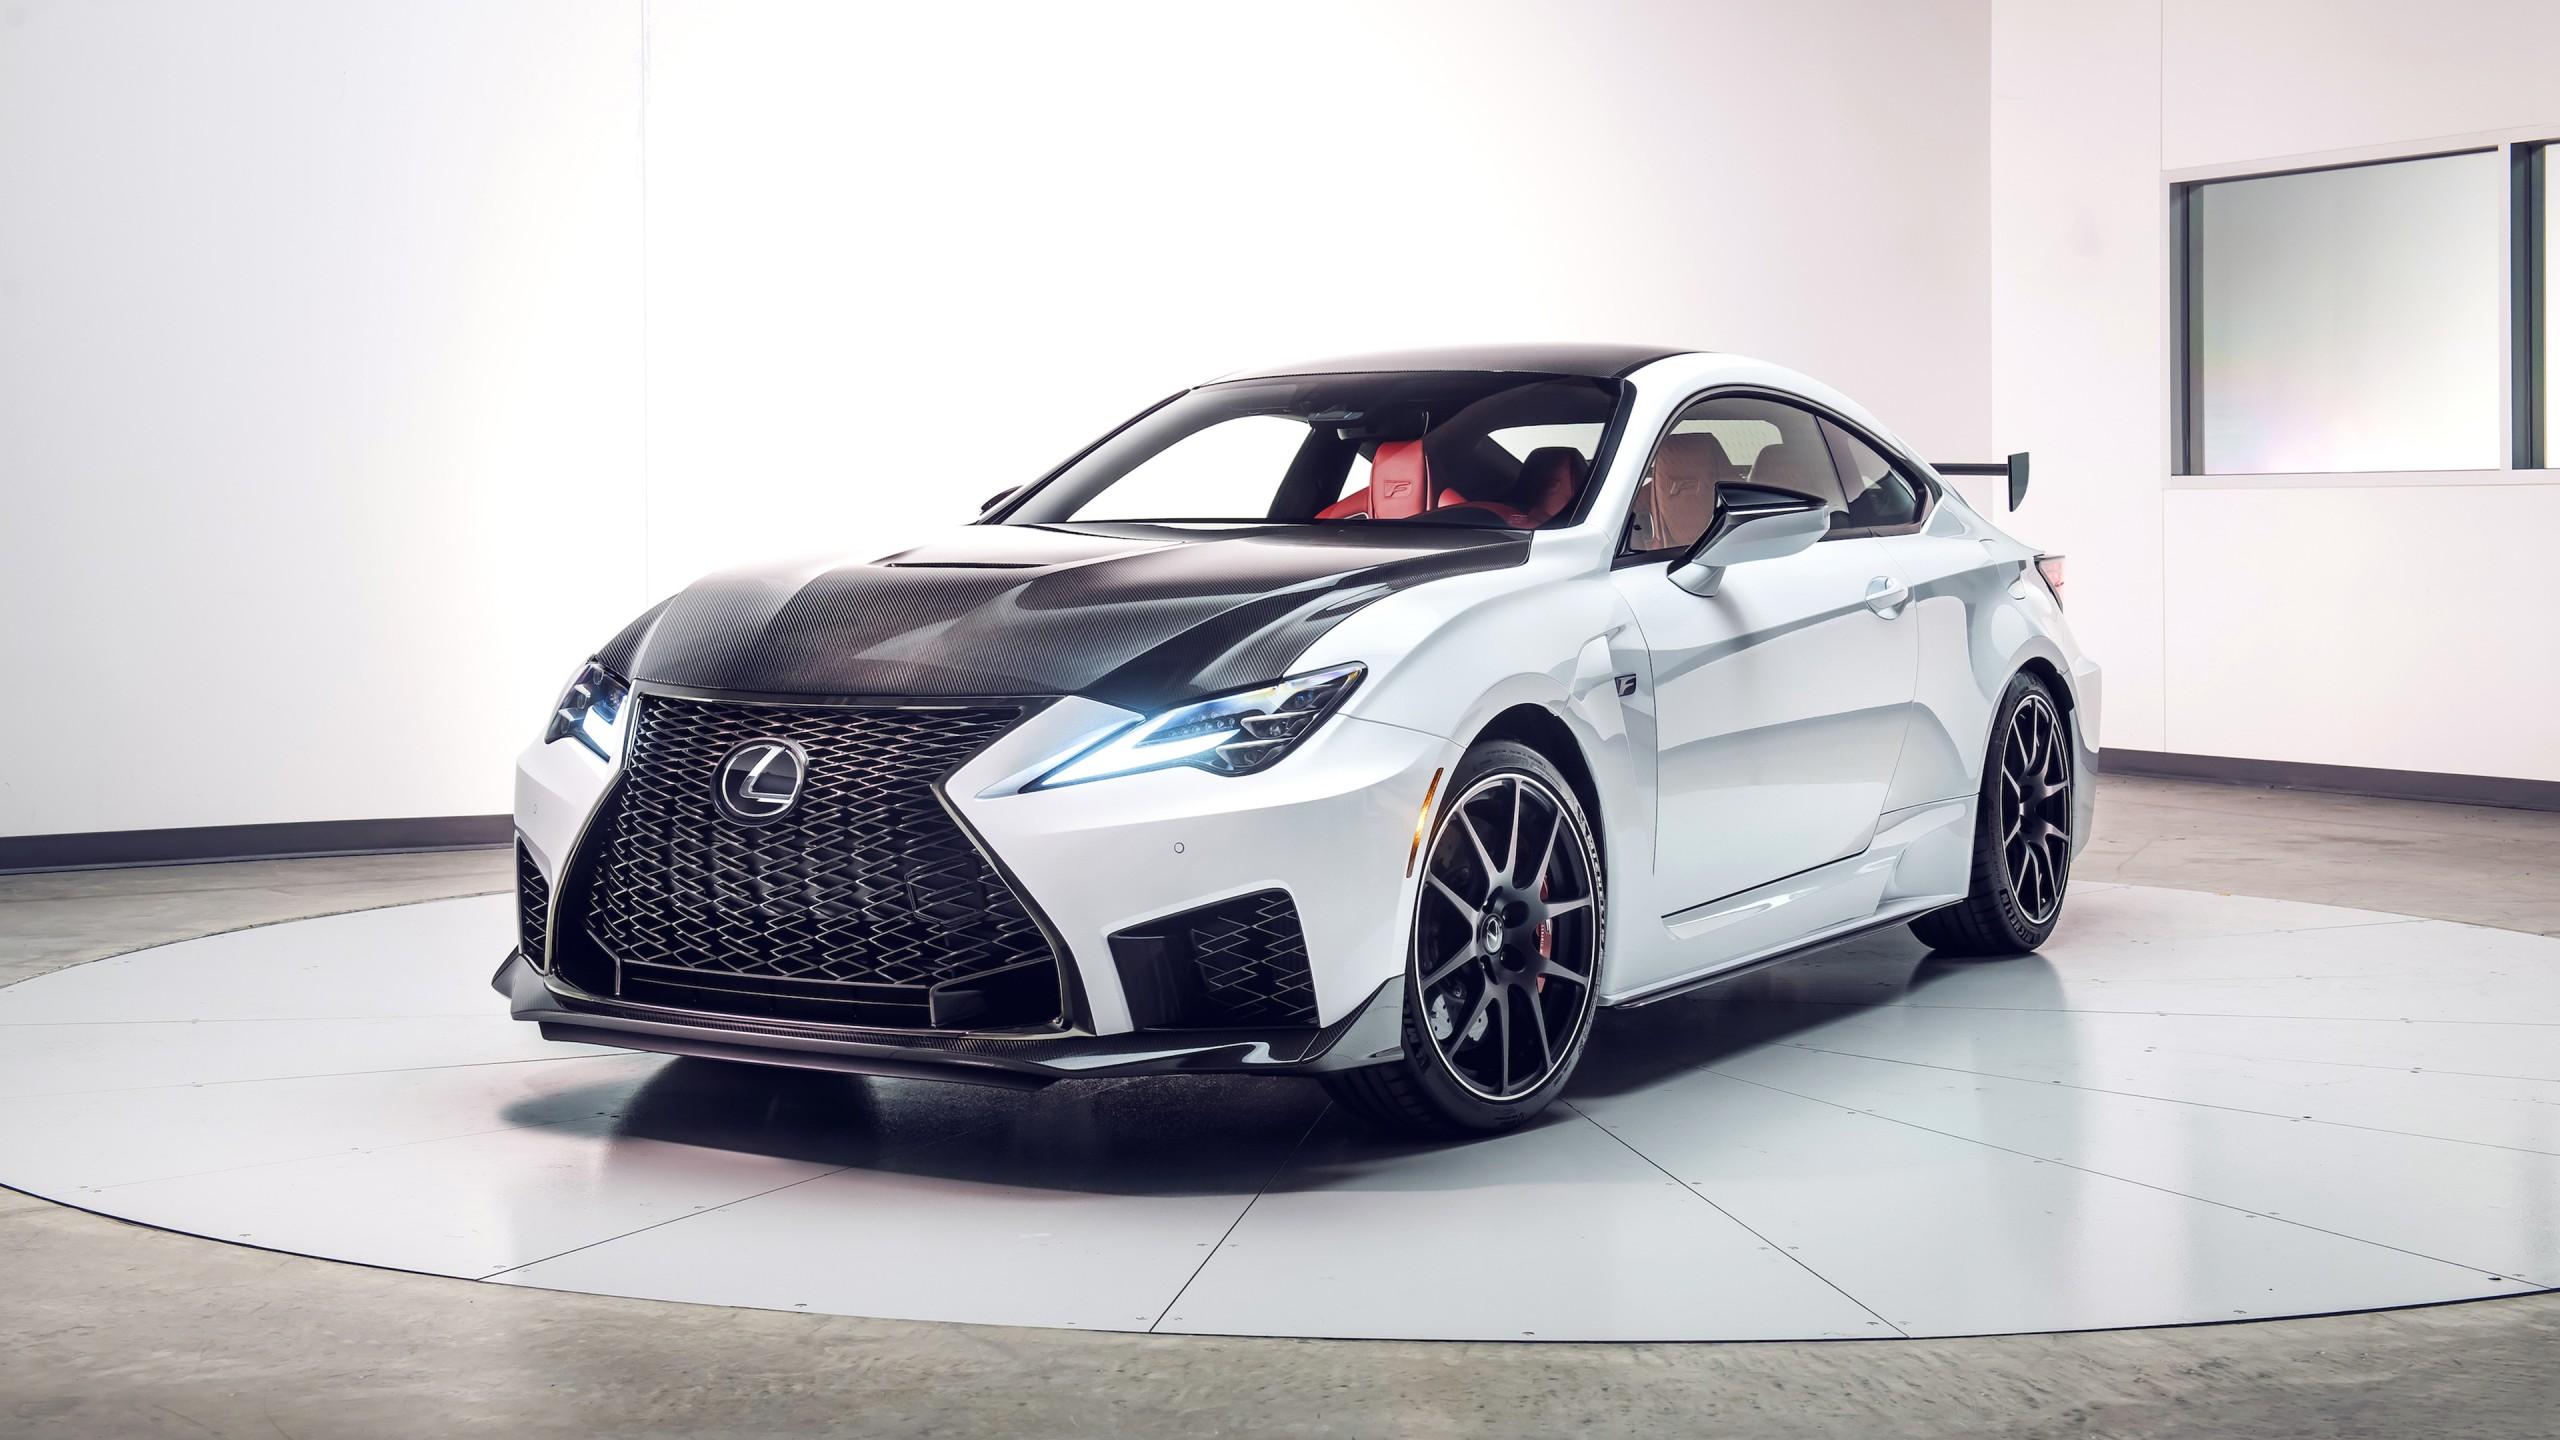 2020 lexus rc f track edition 4k wallpaper | hd car